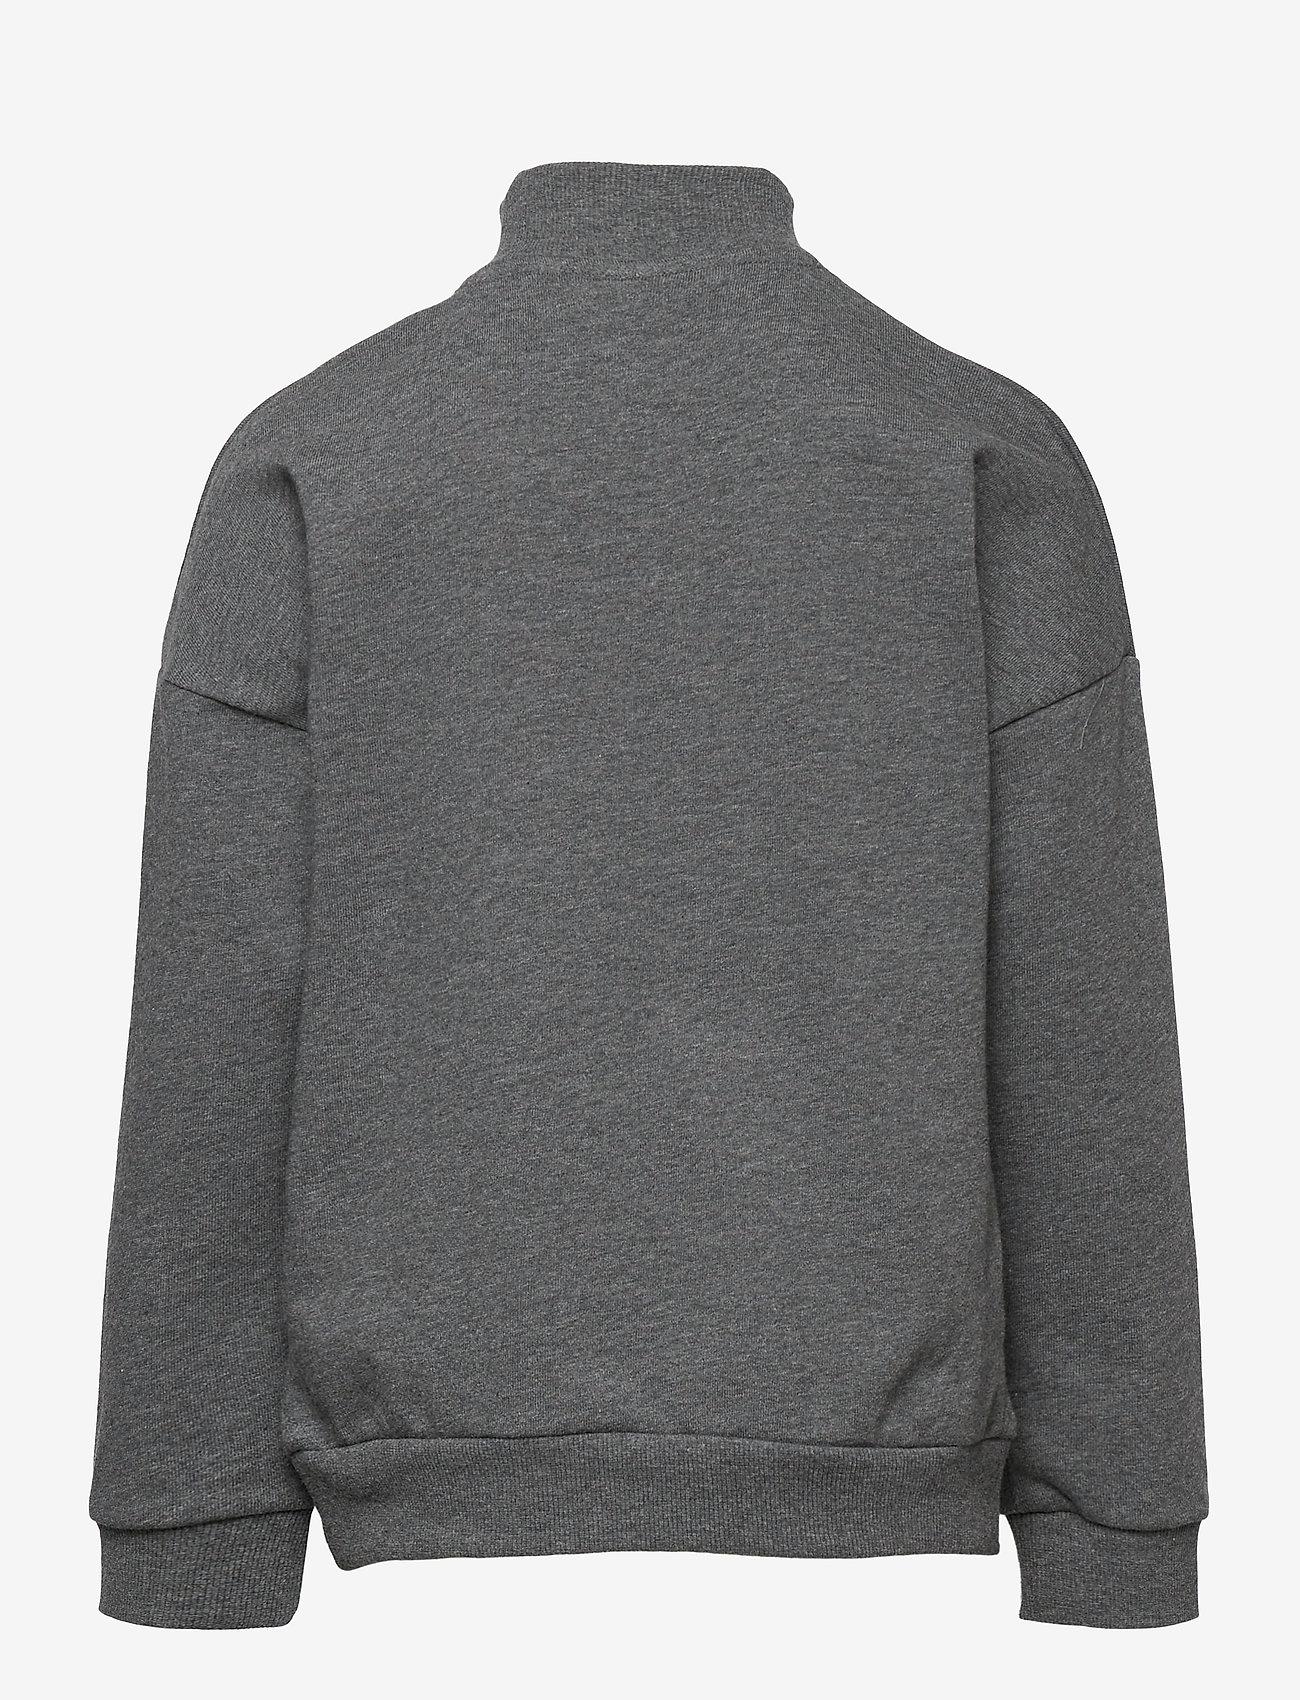 name it - NKMBARALD LS SWEAT UNB - sweatshirts - dark grey melange - 1